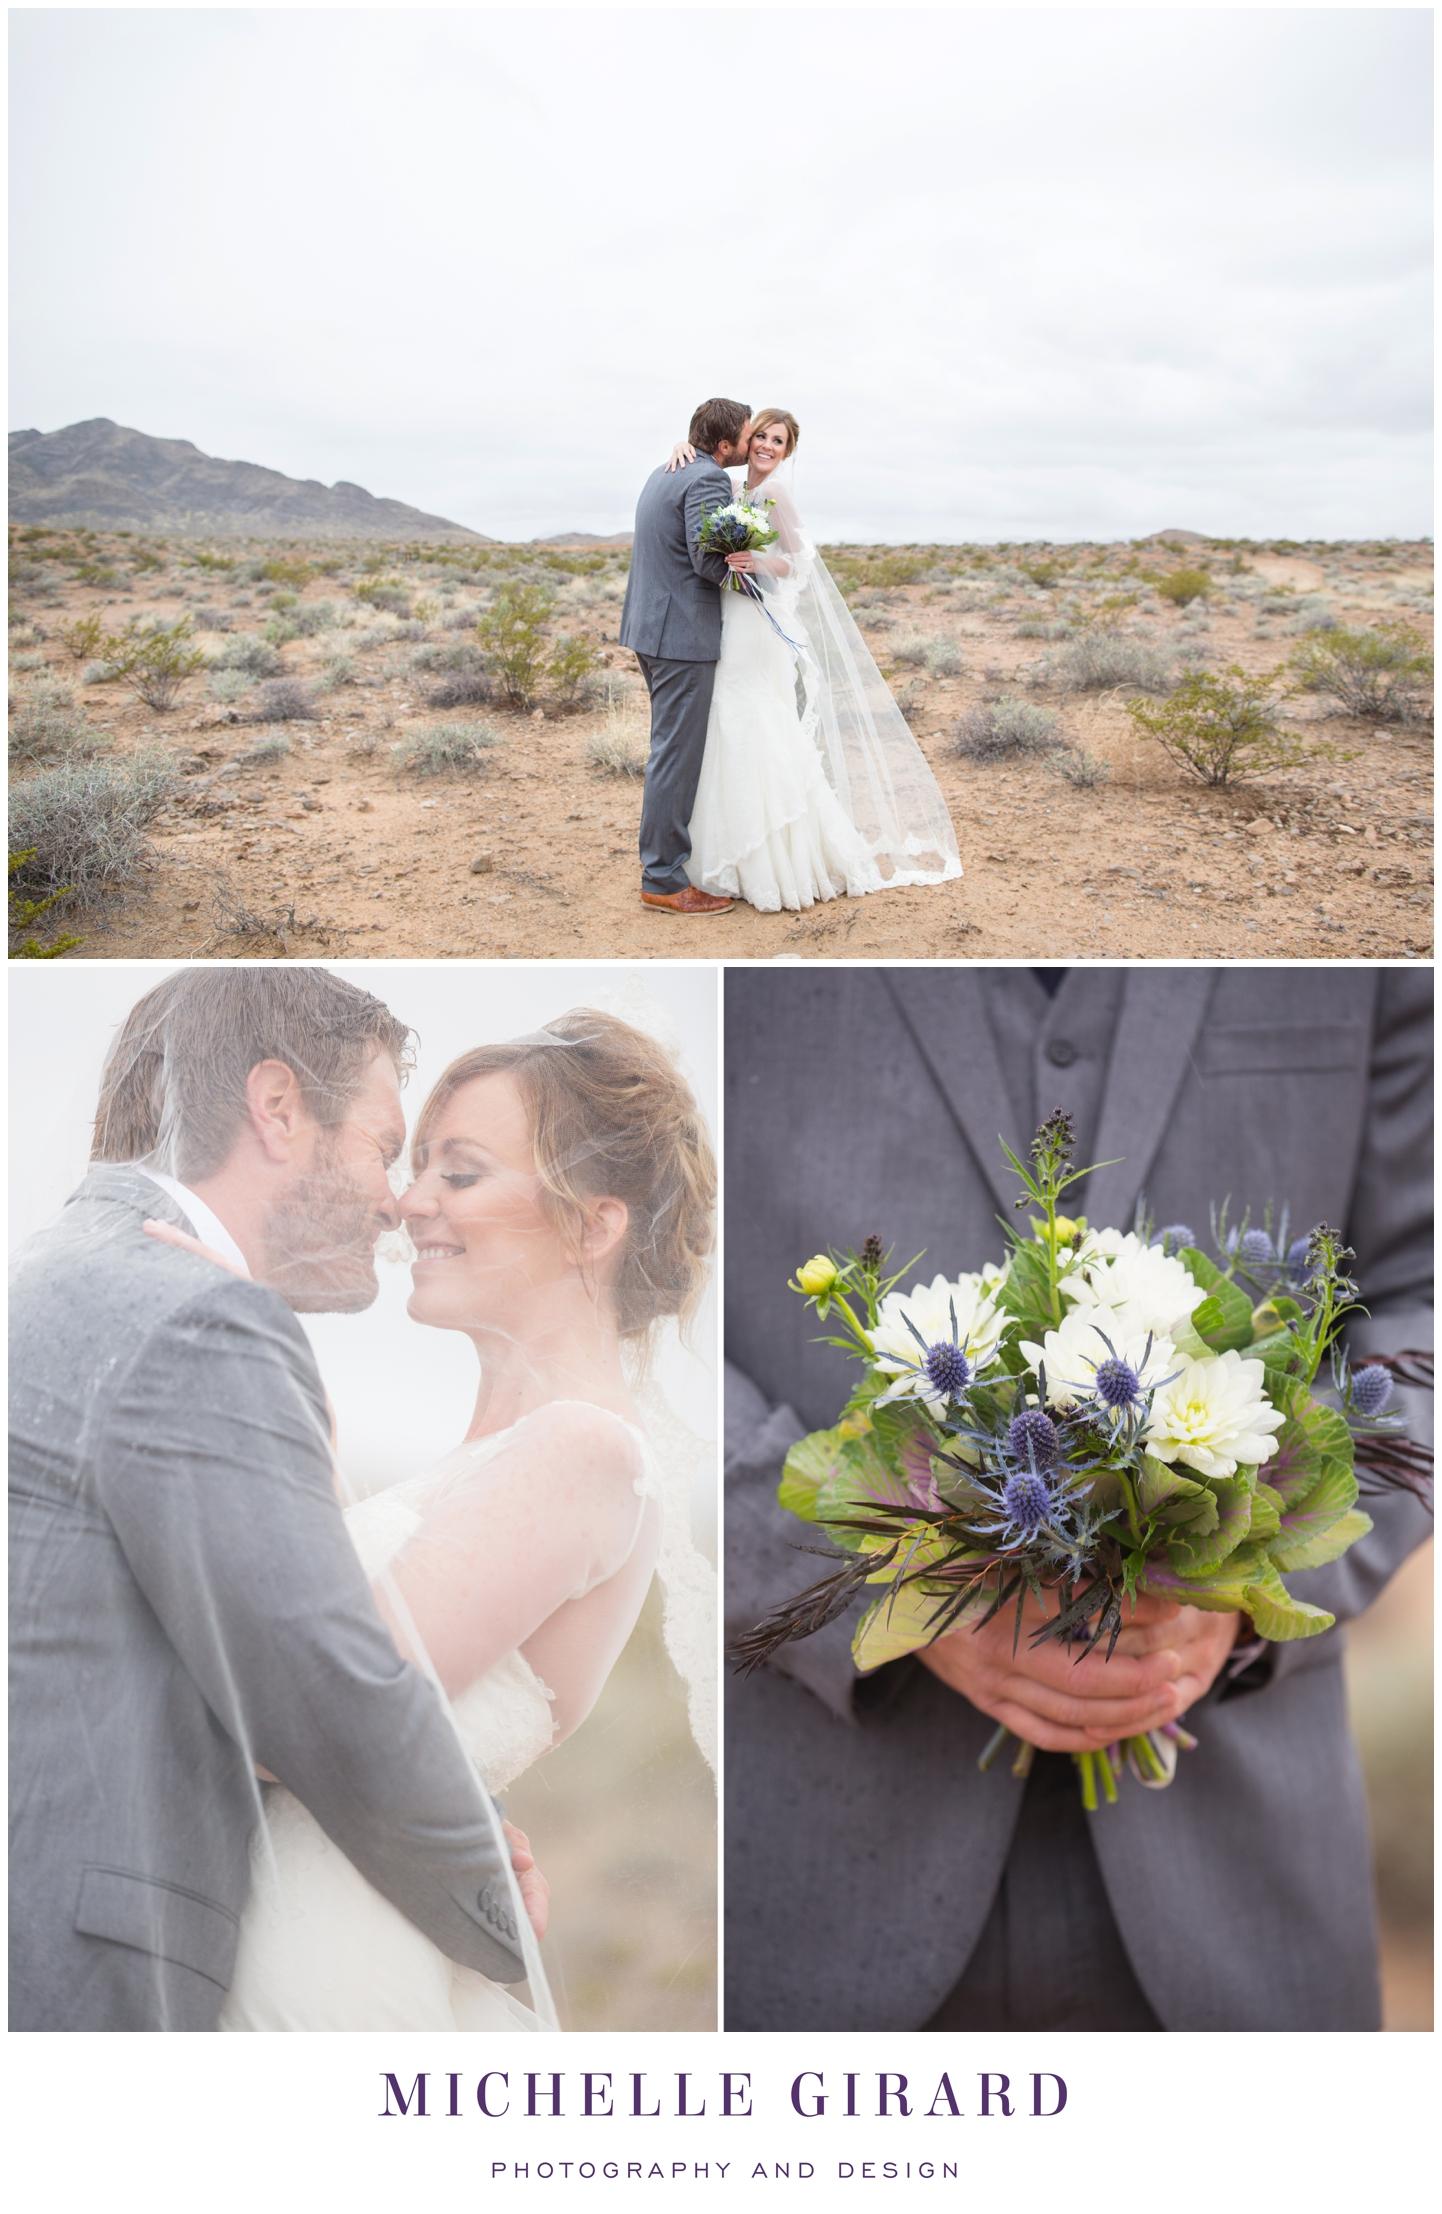 nevada-desert-lace-veil-michelle-girard-wedding-photography12.jpg